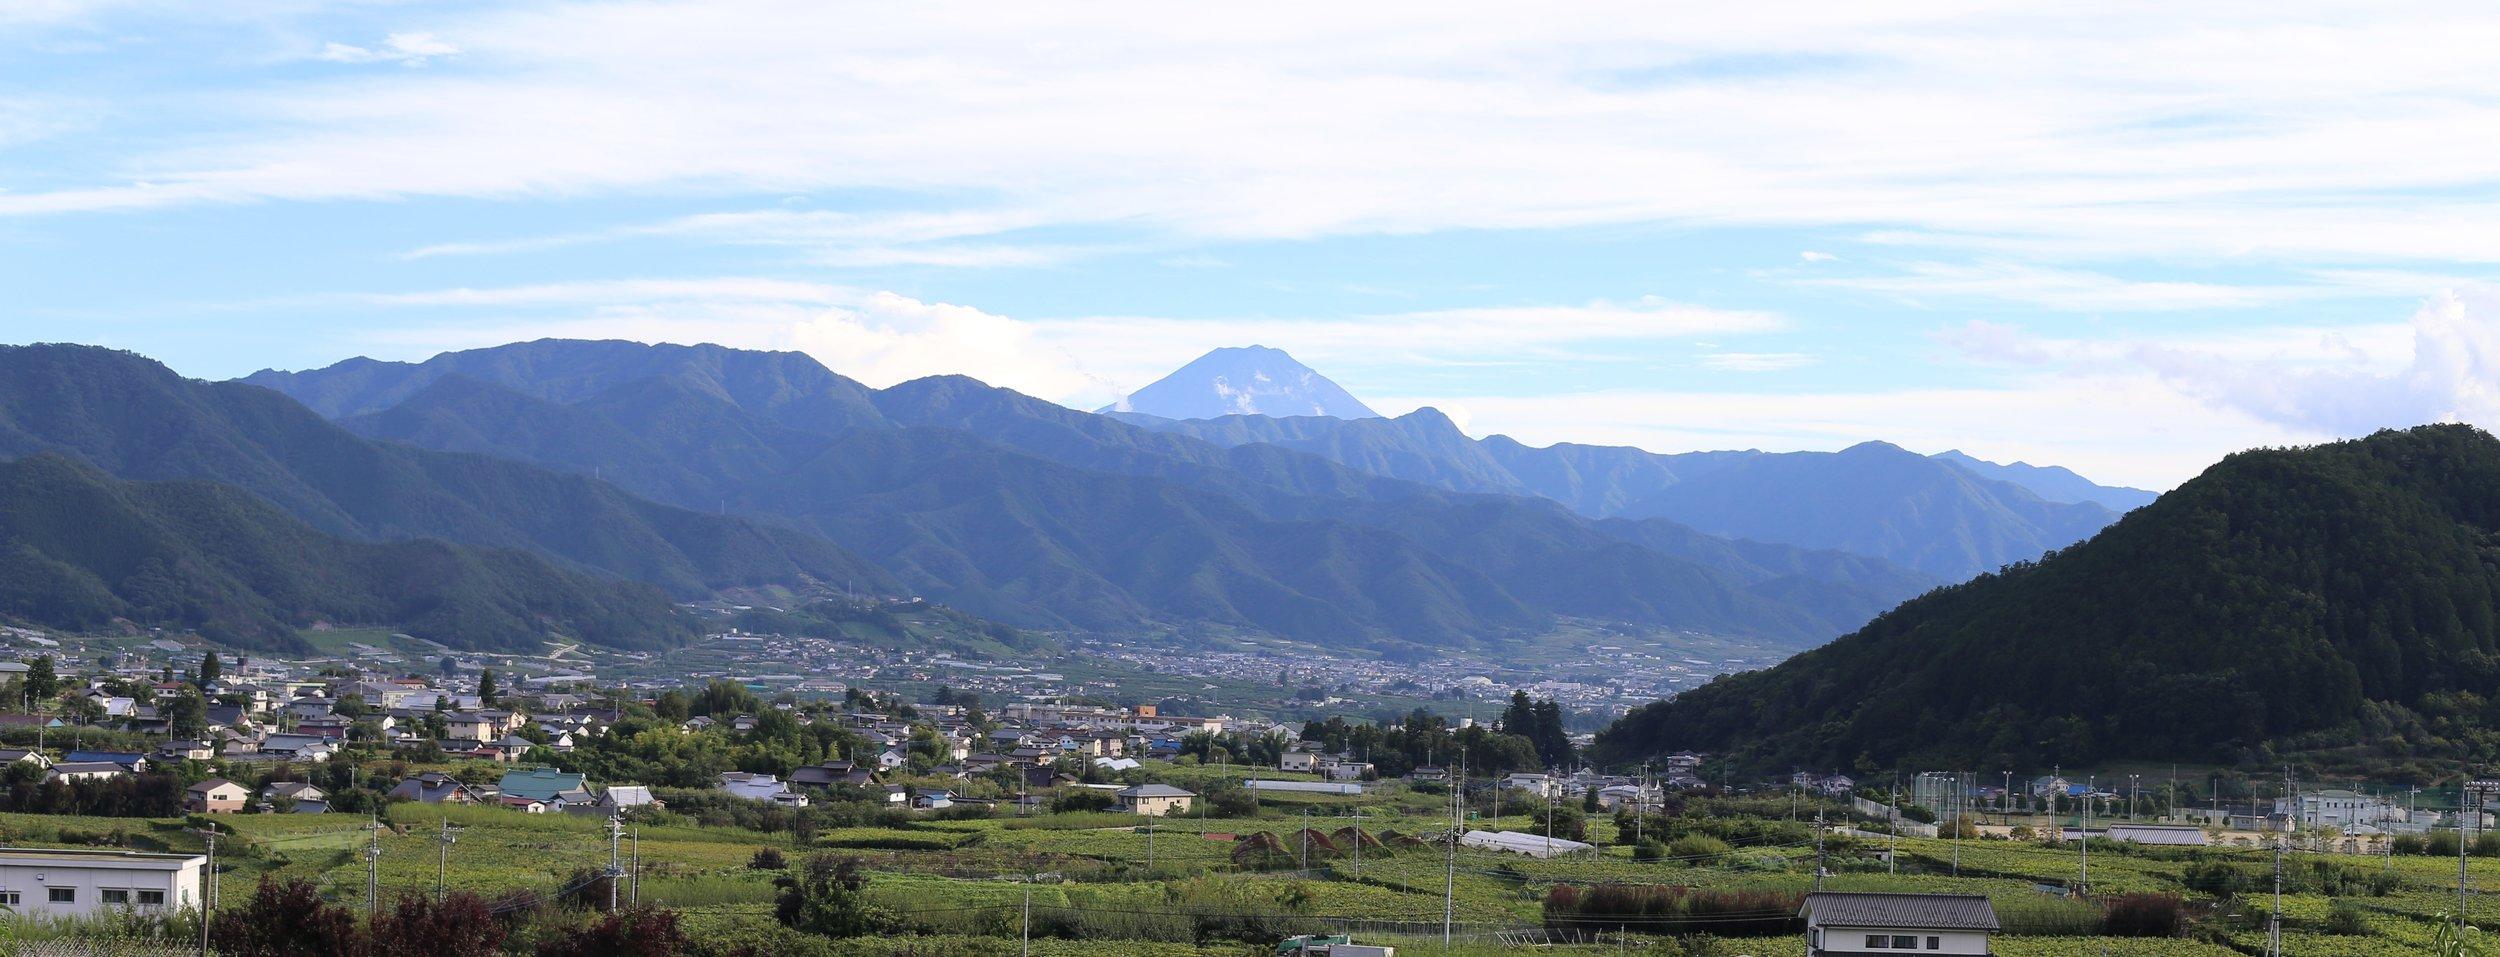 The Koshu Valley, looking south towards Mt. Fuji.